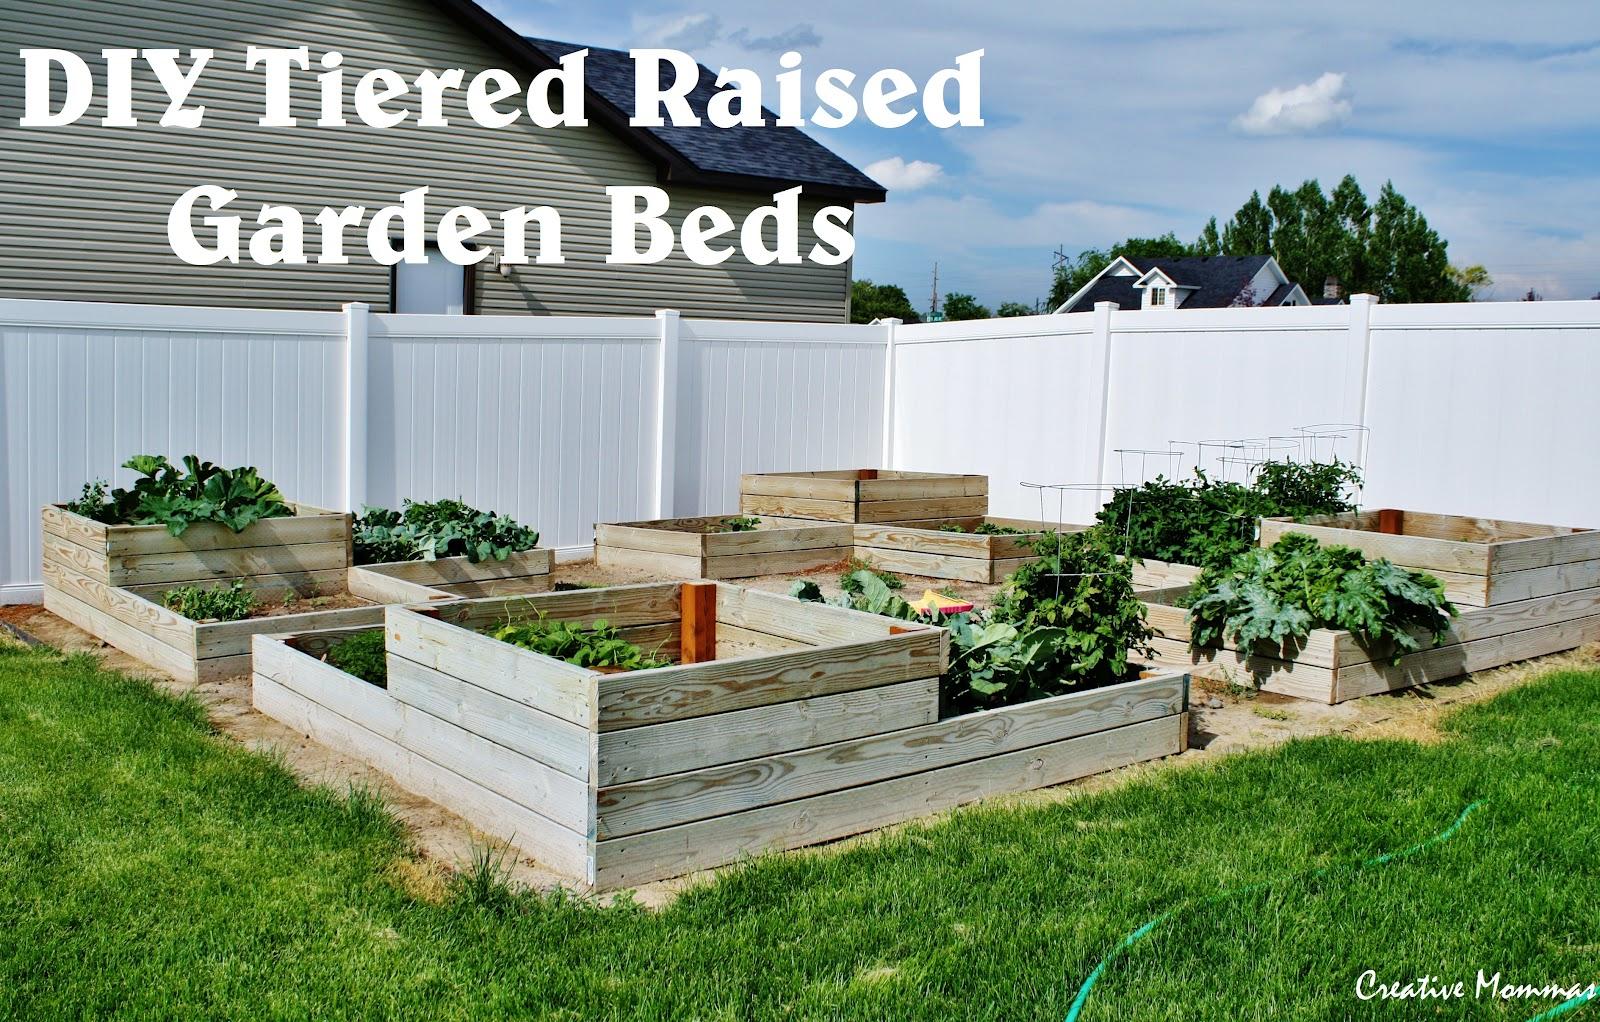 Creative Mommas DIY Tiered Raised Garden Beds – Tiered Raised Garden Bed Plans